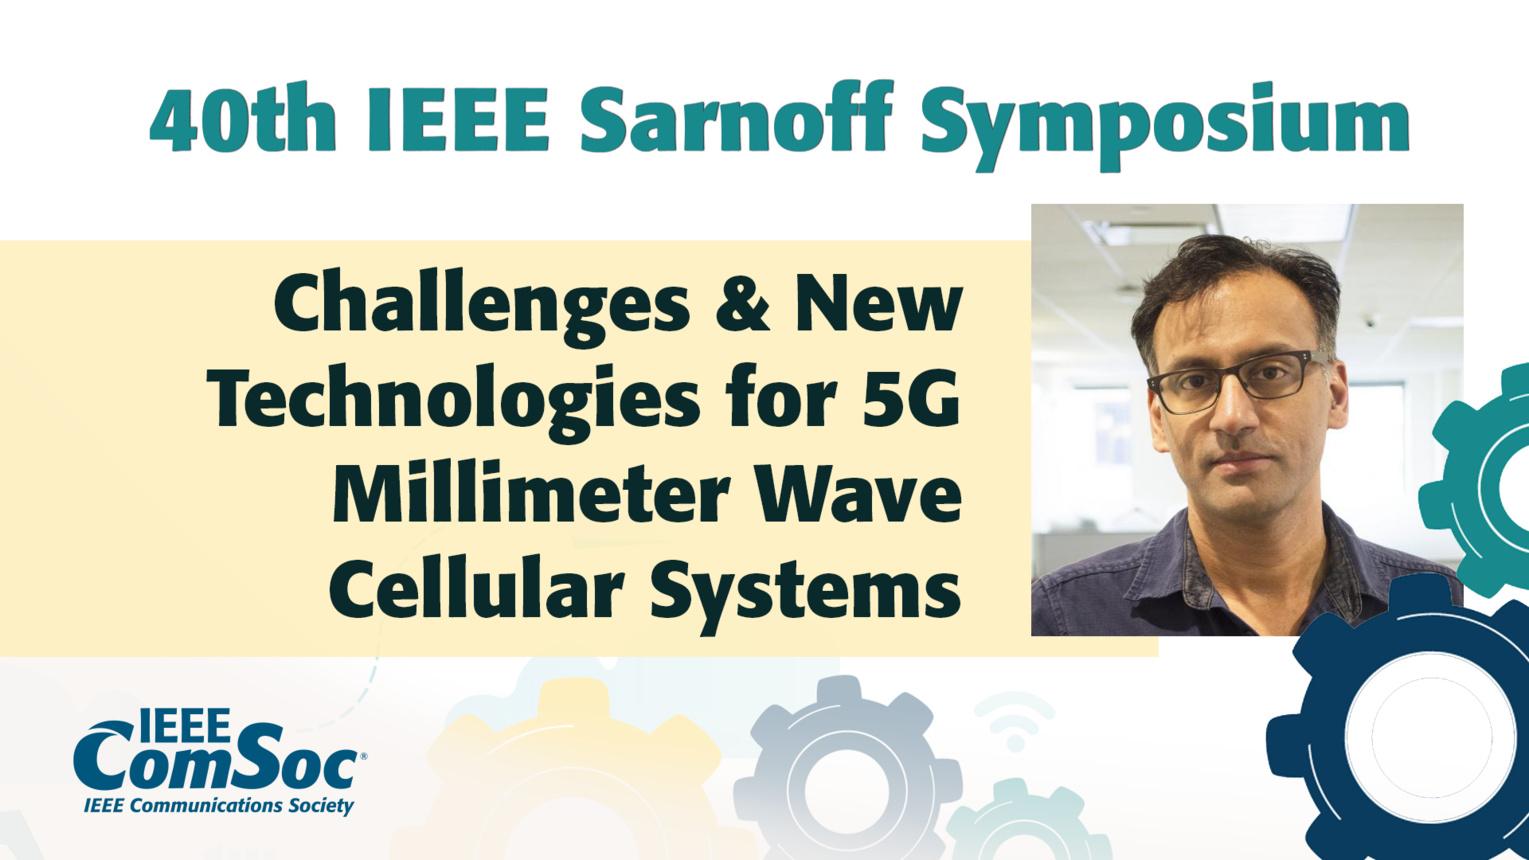 5G Millimeter Wave Cellular Systems - Sundeep Rangan - IEEE Sarnoff Symposium, 2019